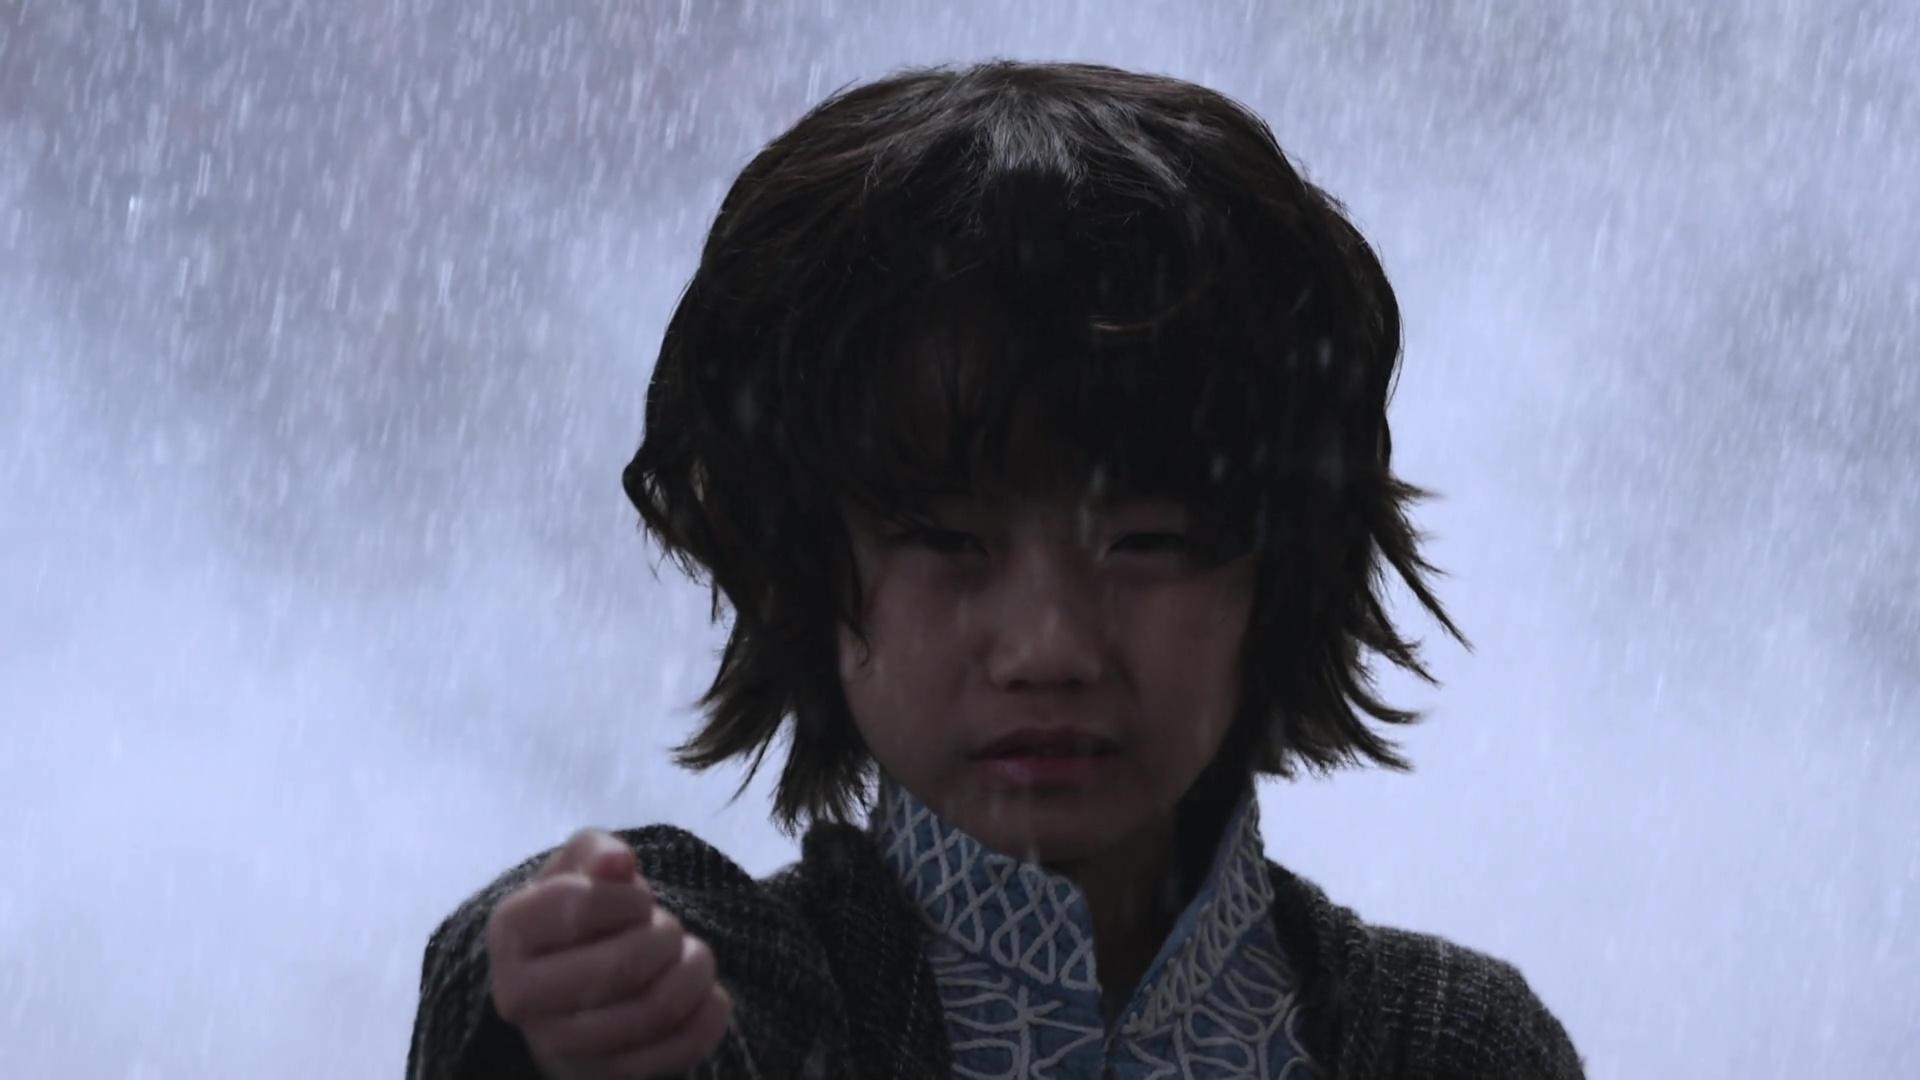 Kamen Rider Saber Episode 25 Recap